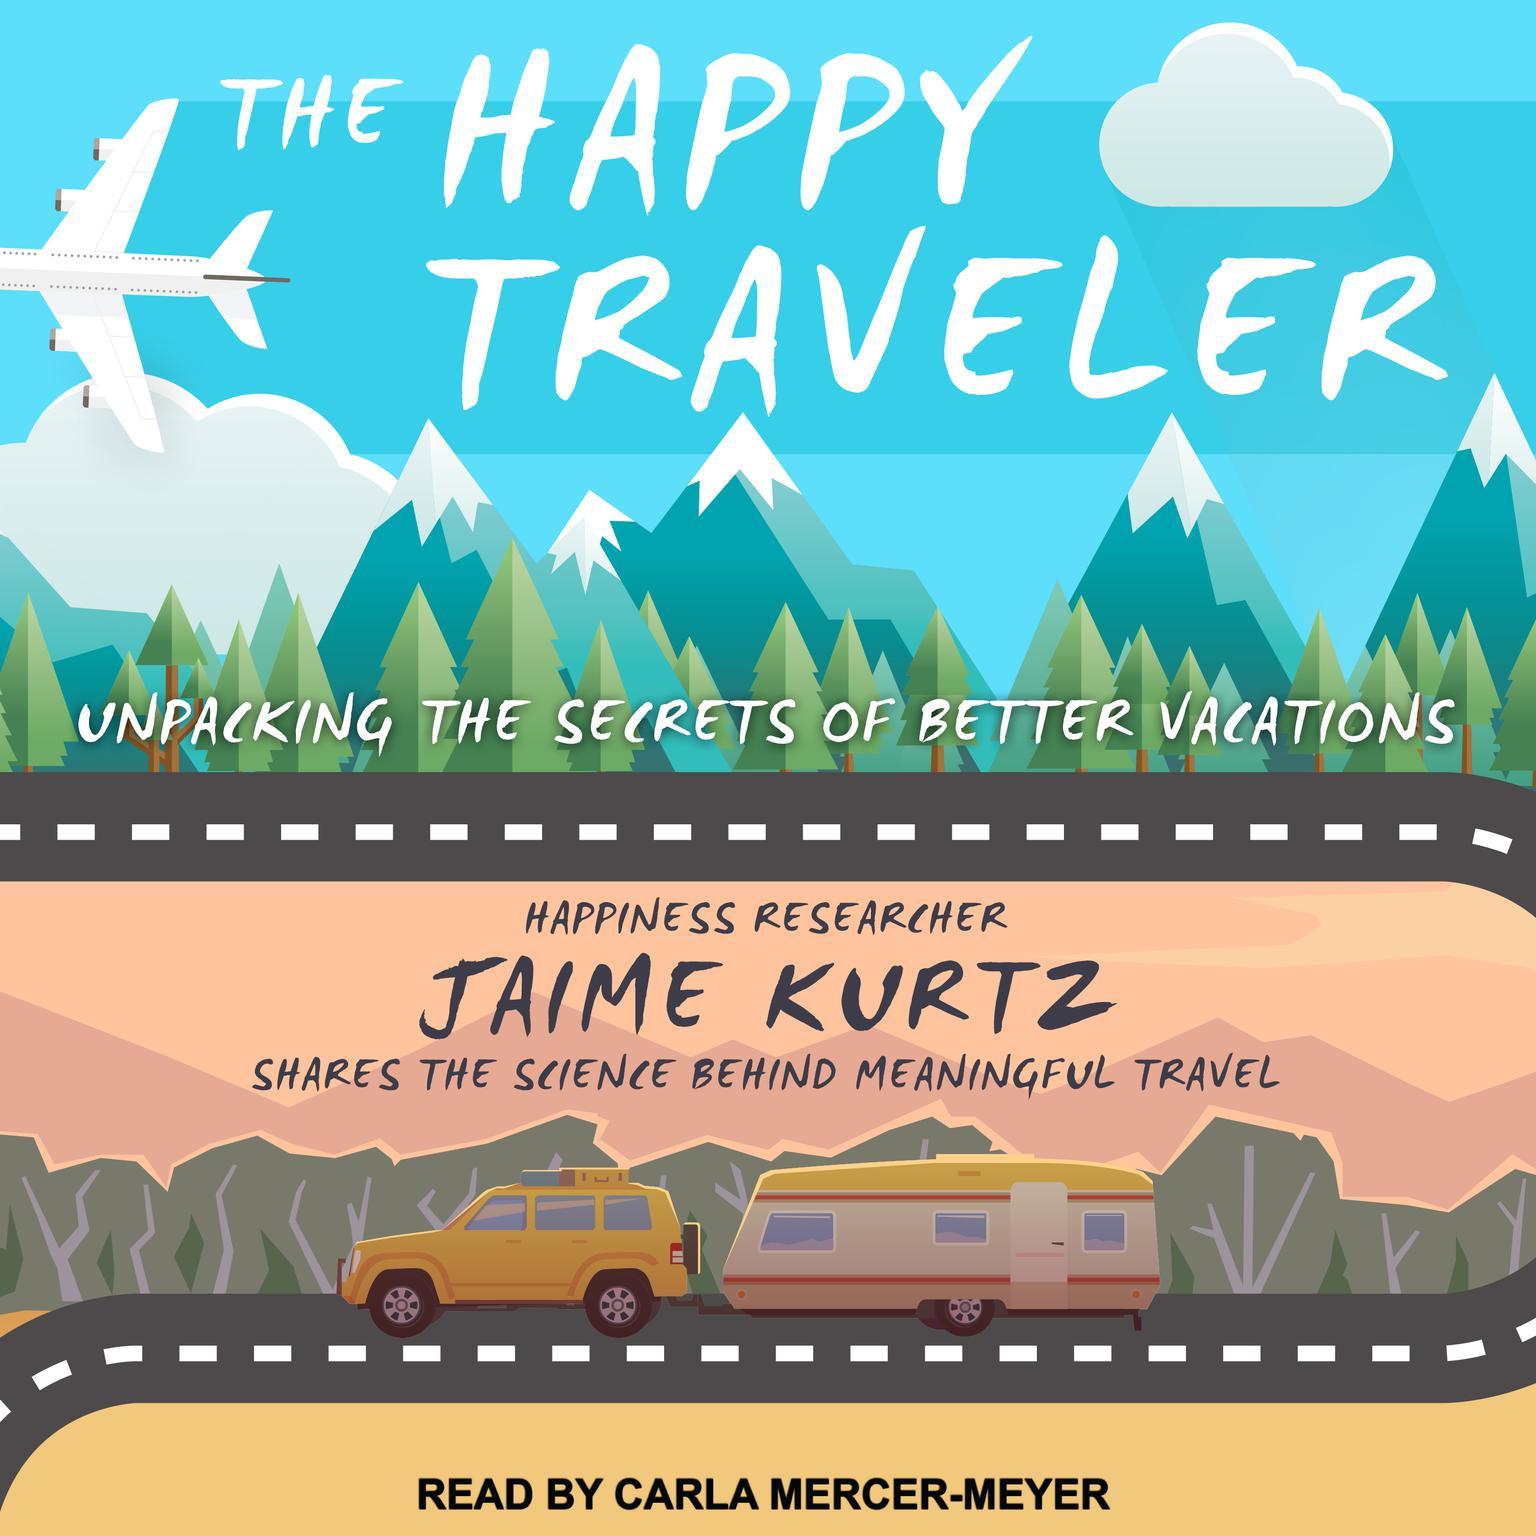 The Happy Traveler: Unpacking the Secrets of Better Vacations Audiobook, by Jaime Kurtz